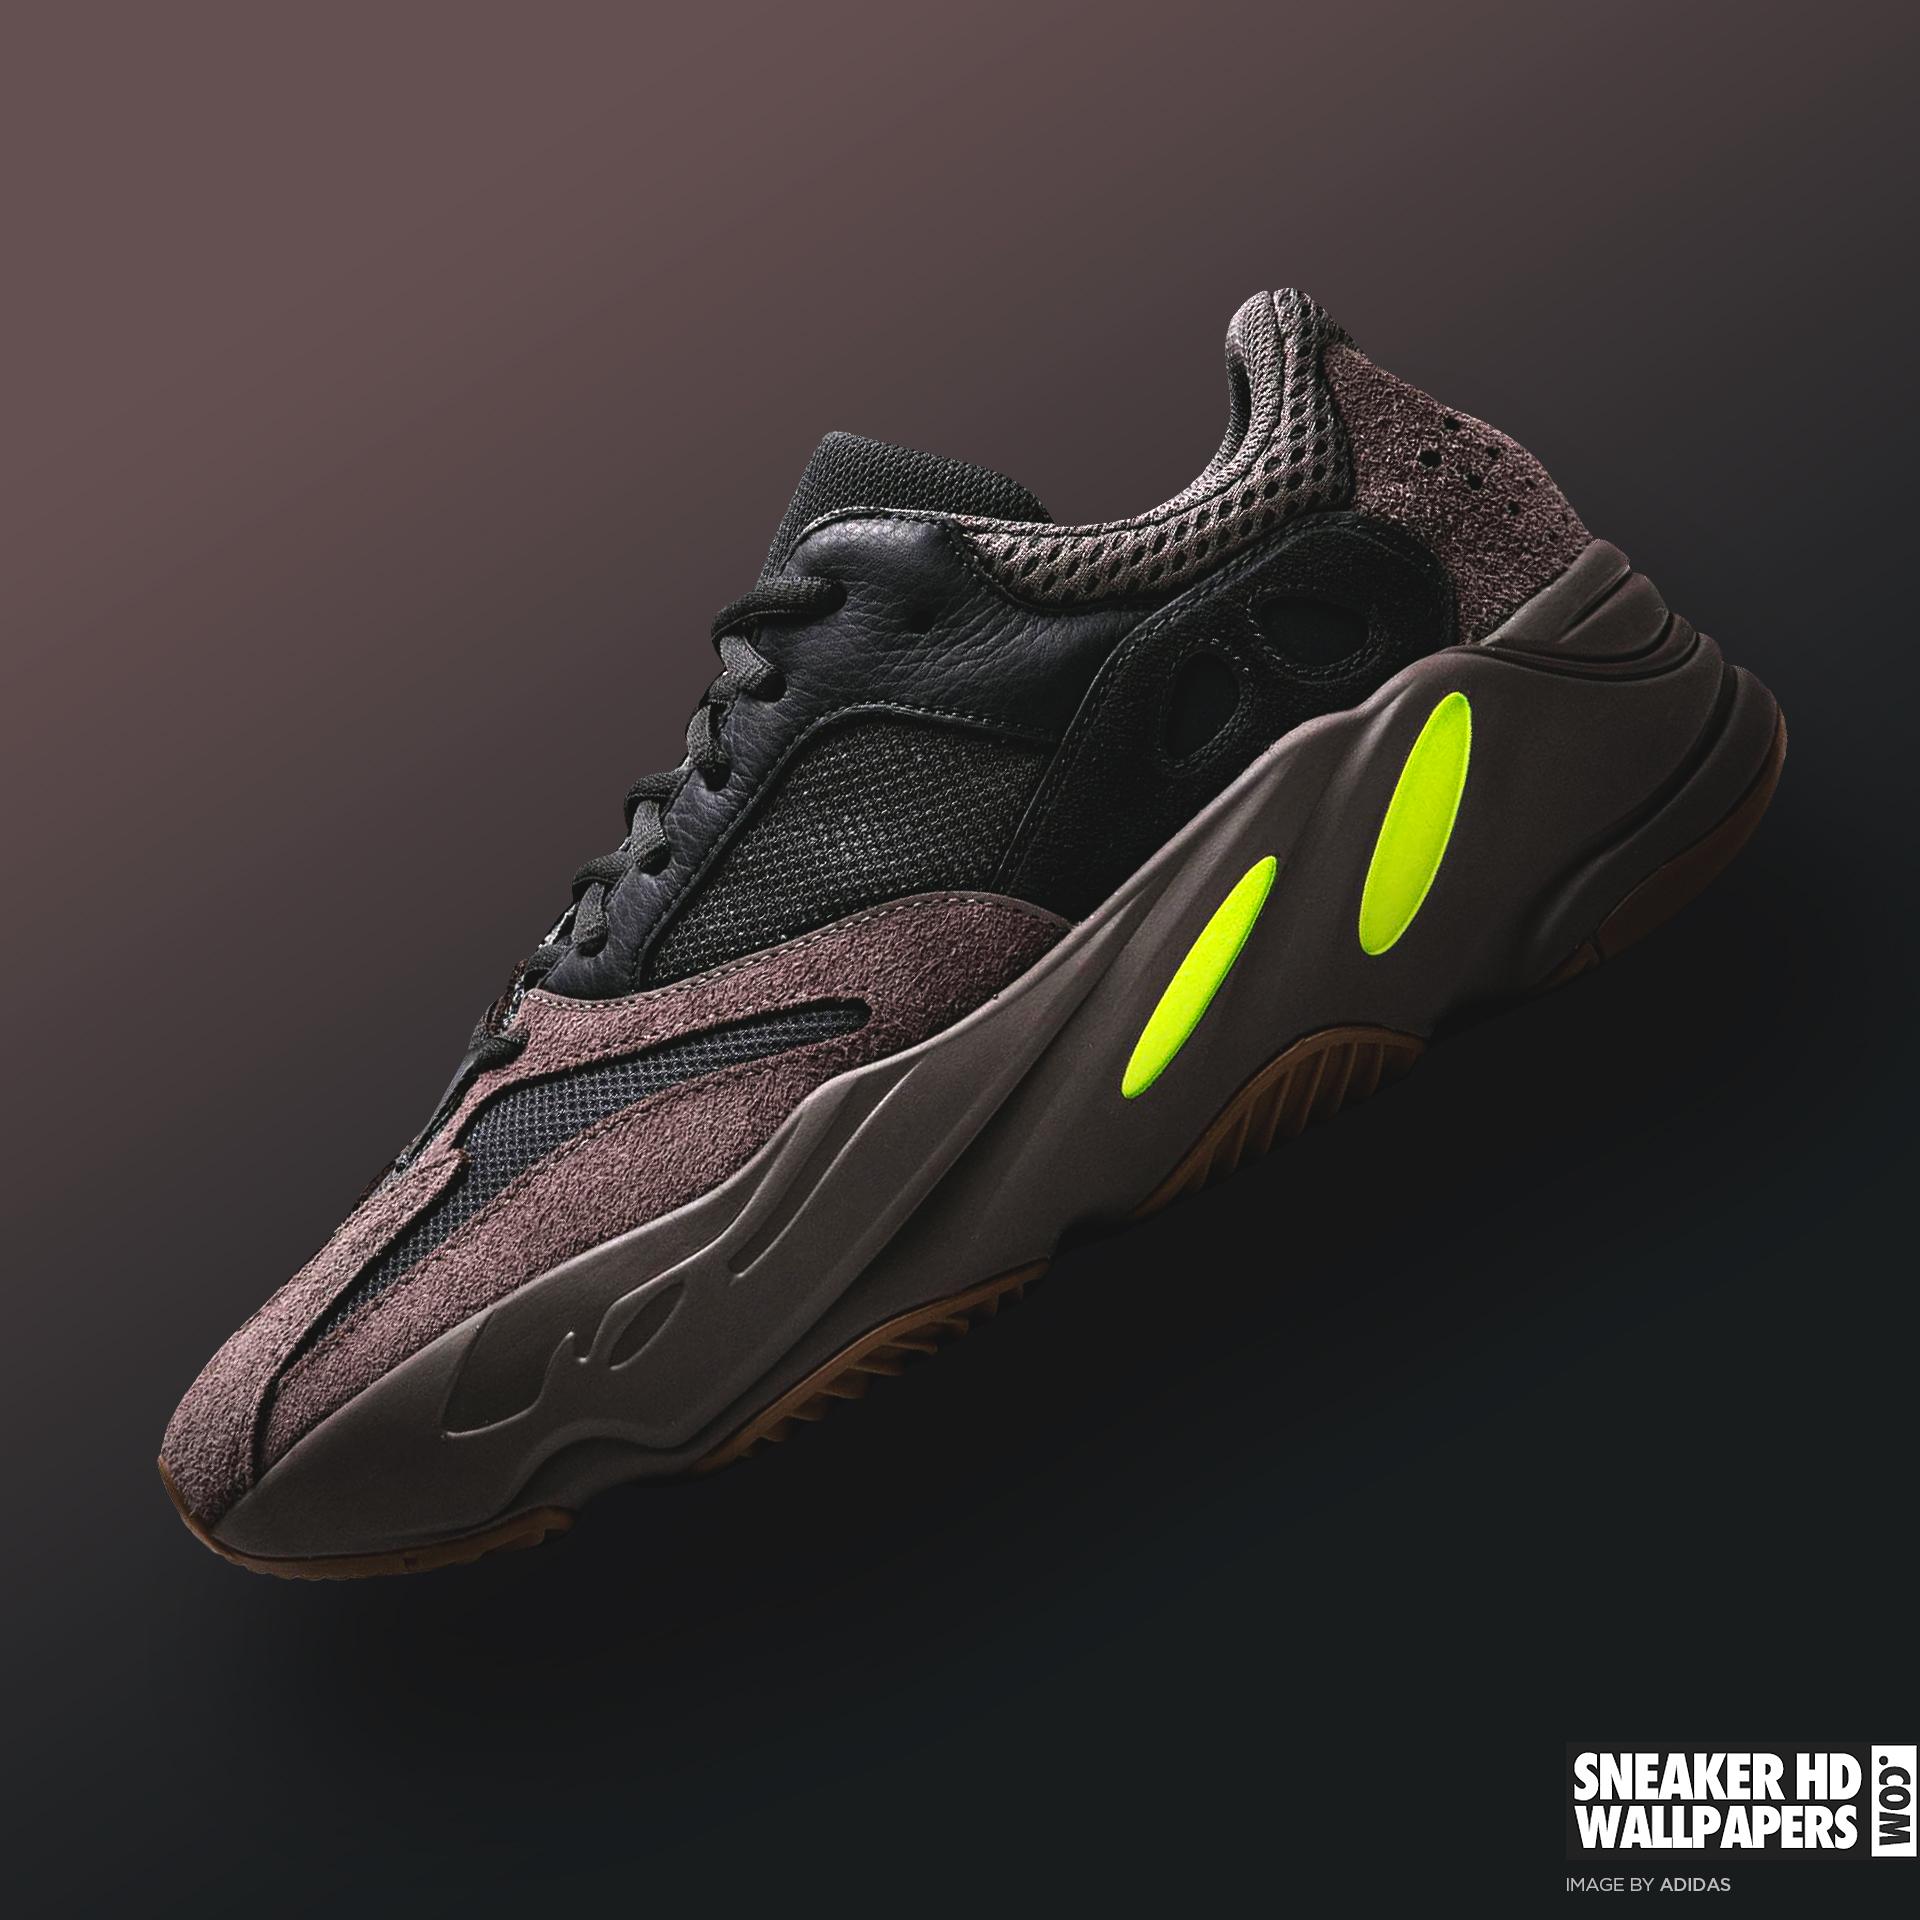 Sneakerhdwallpapers Com Your Favorite Sneakers In 4k